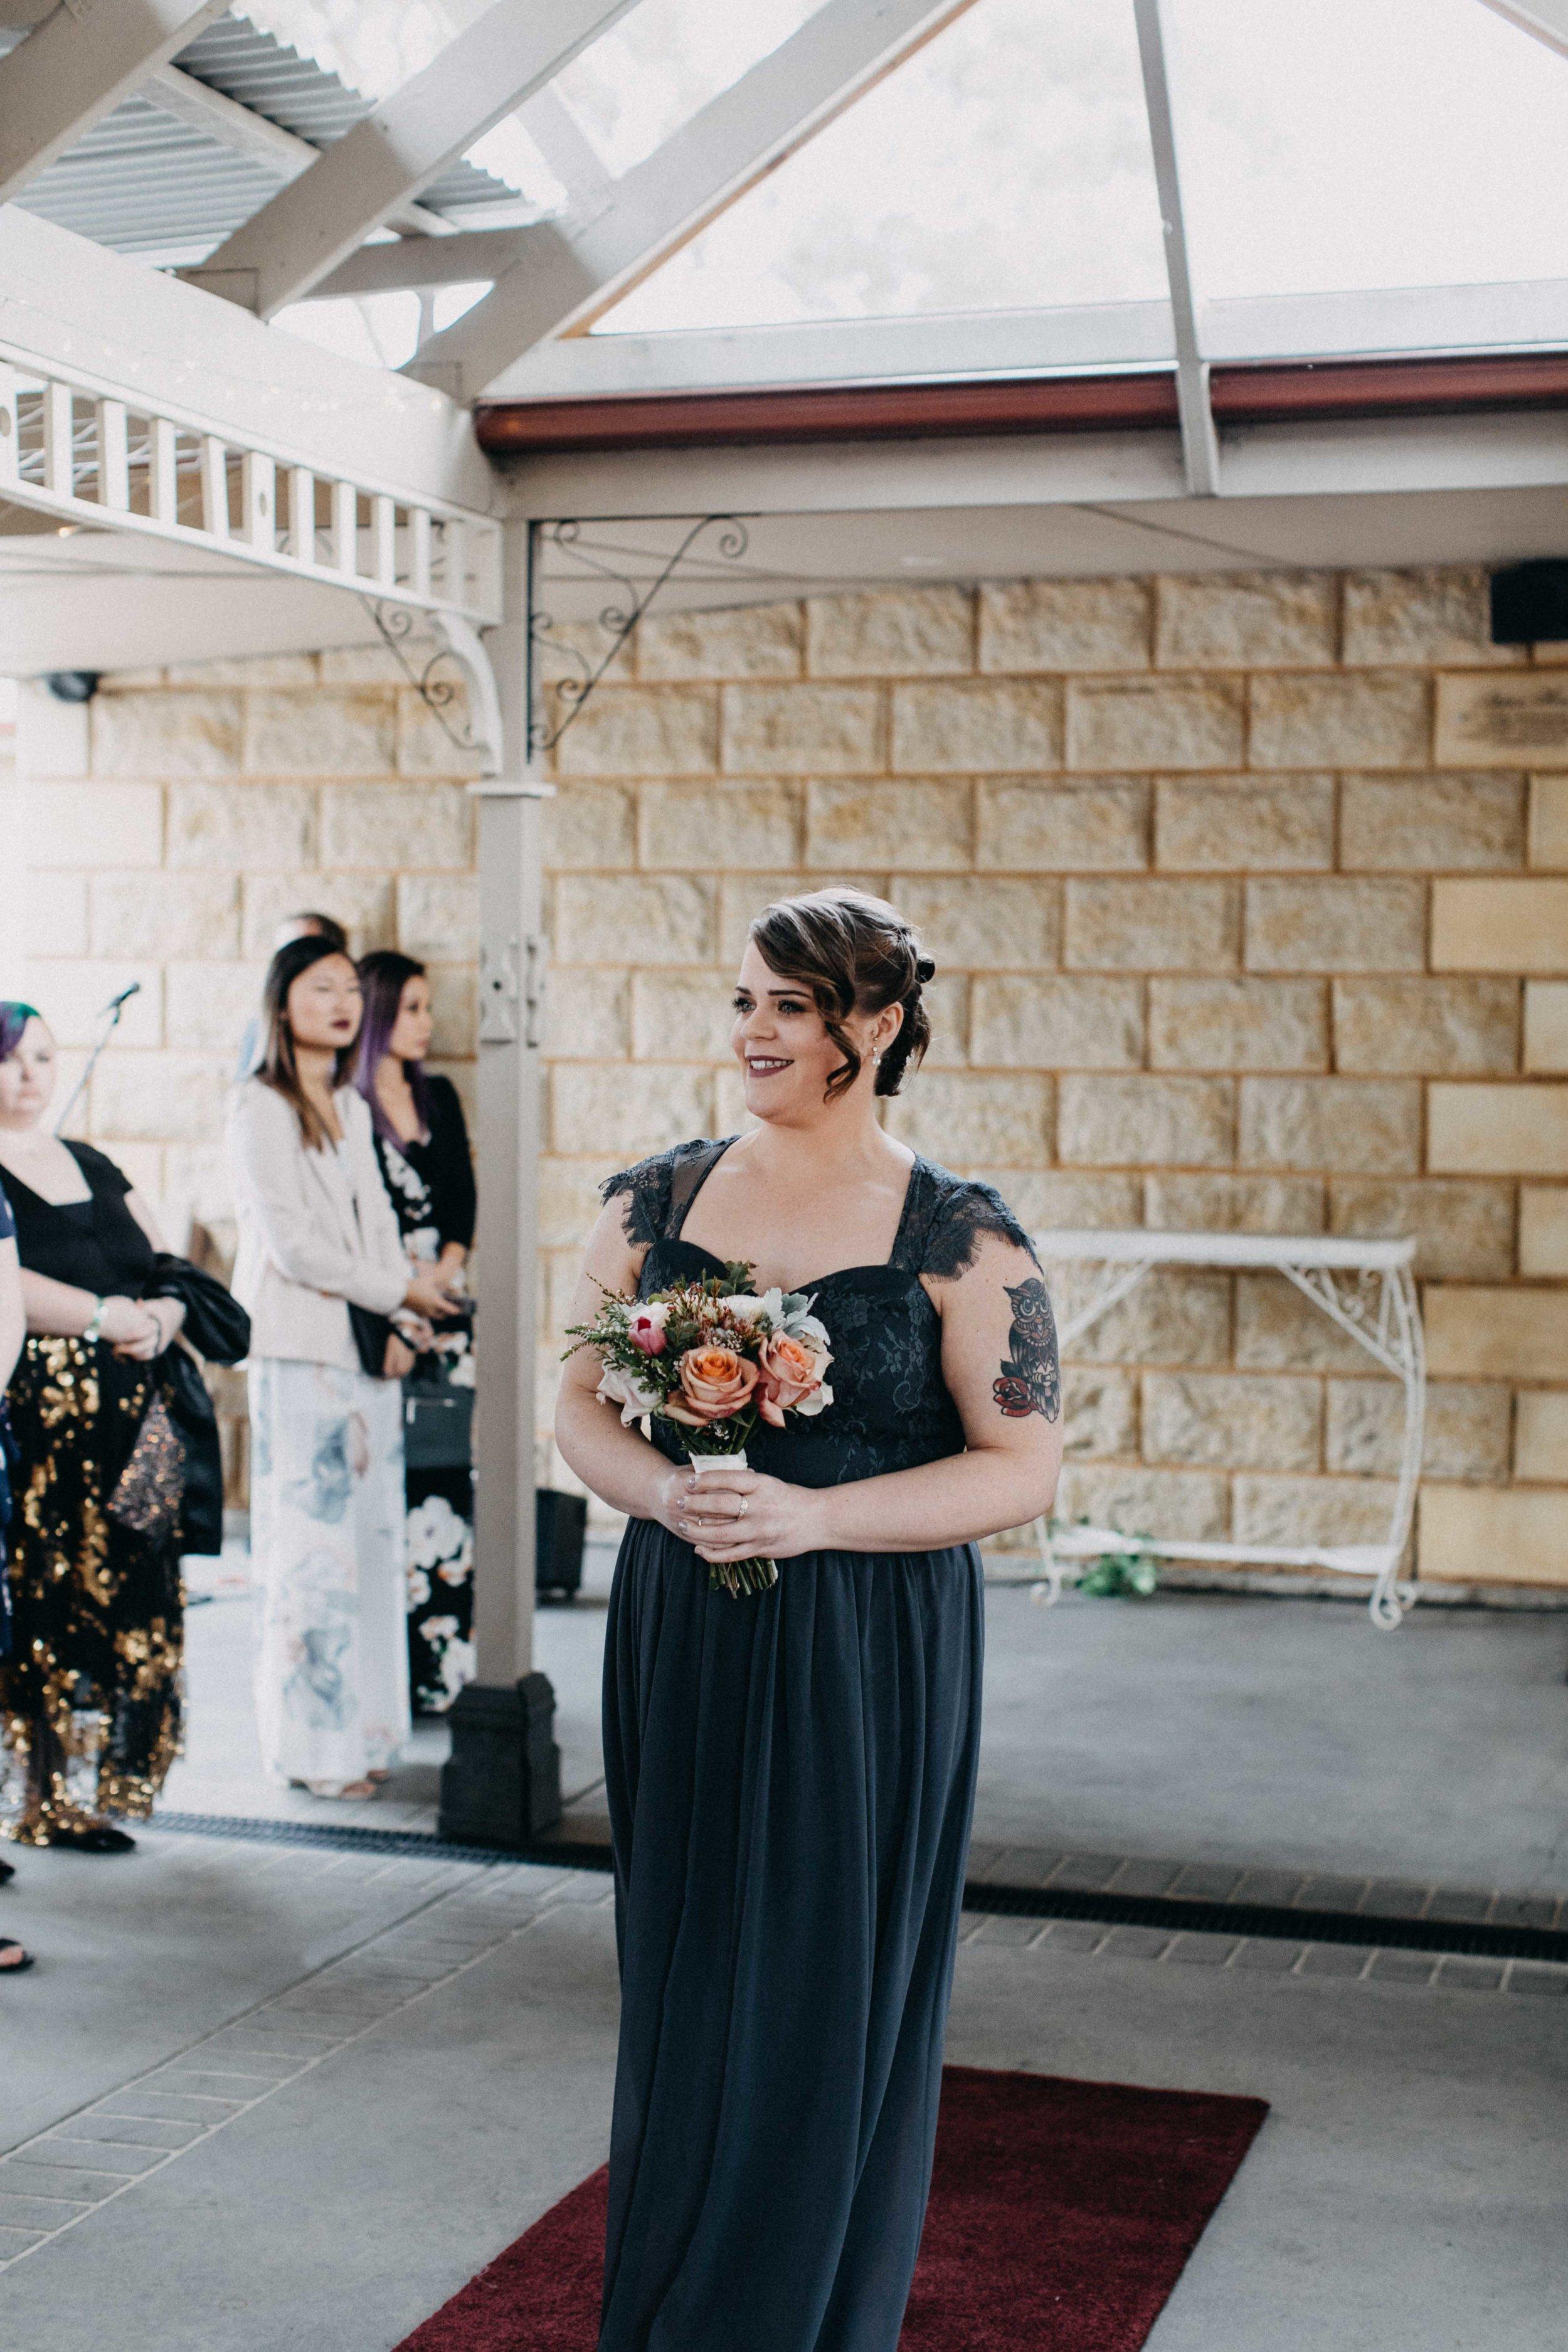 appin-house-wedding-macarthur-www.emilyobrienphotography.net-84.jpg